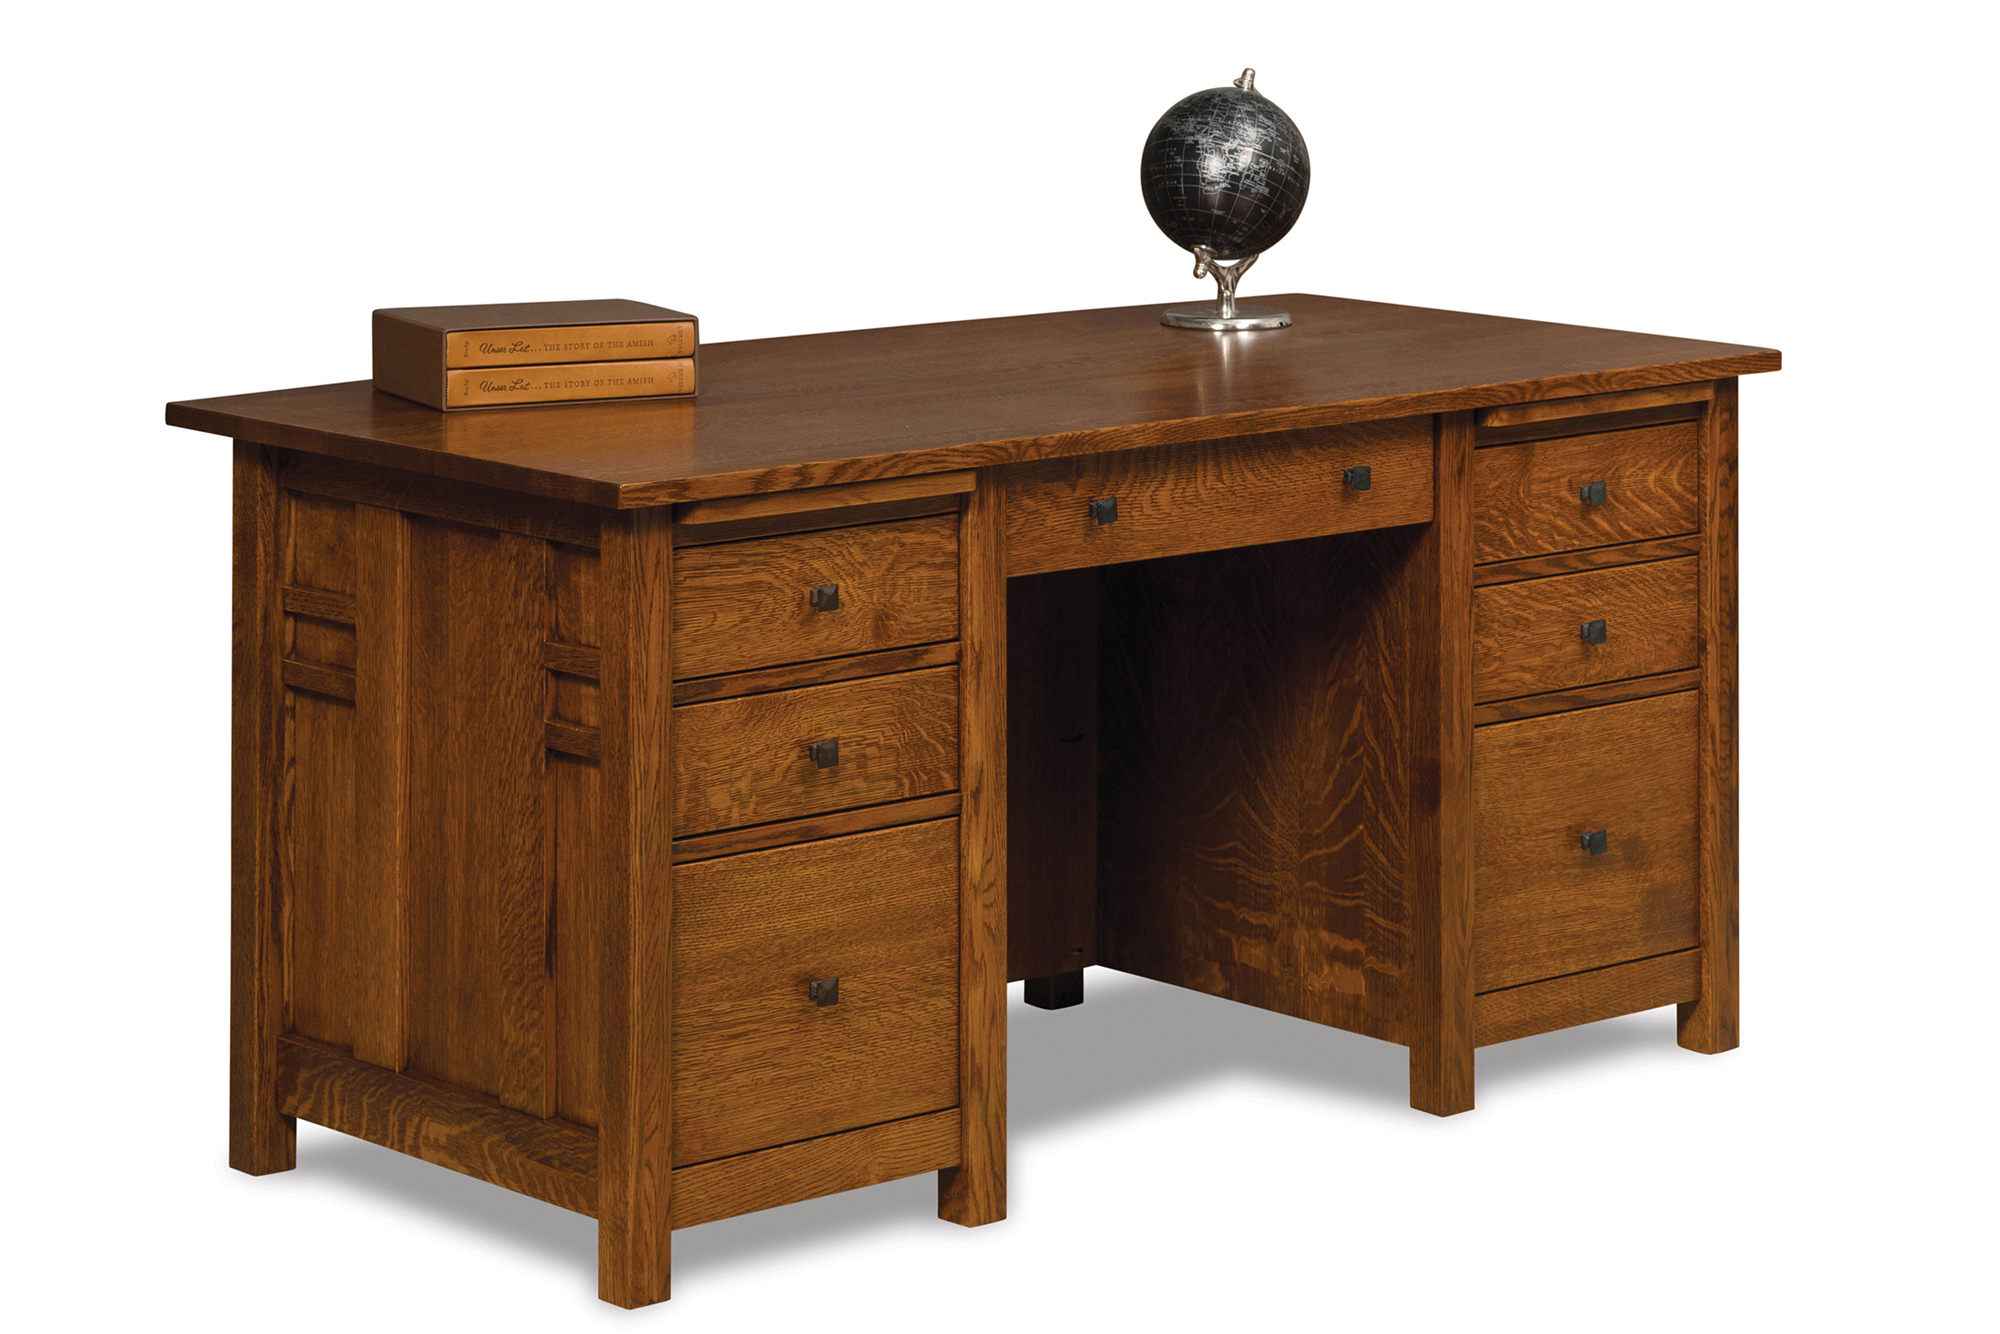 Kascade Amish Furniture Store Mankato Mn